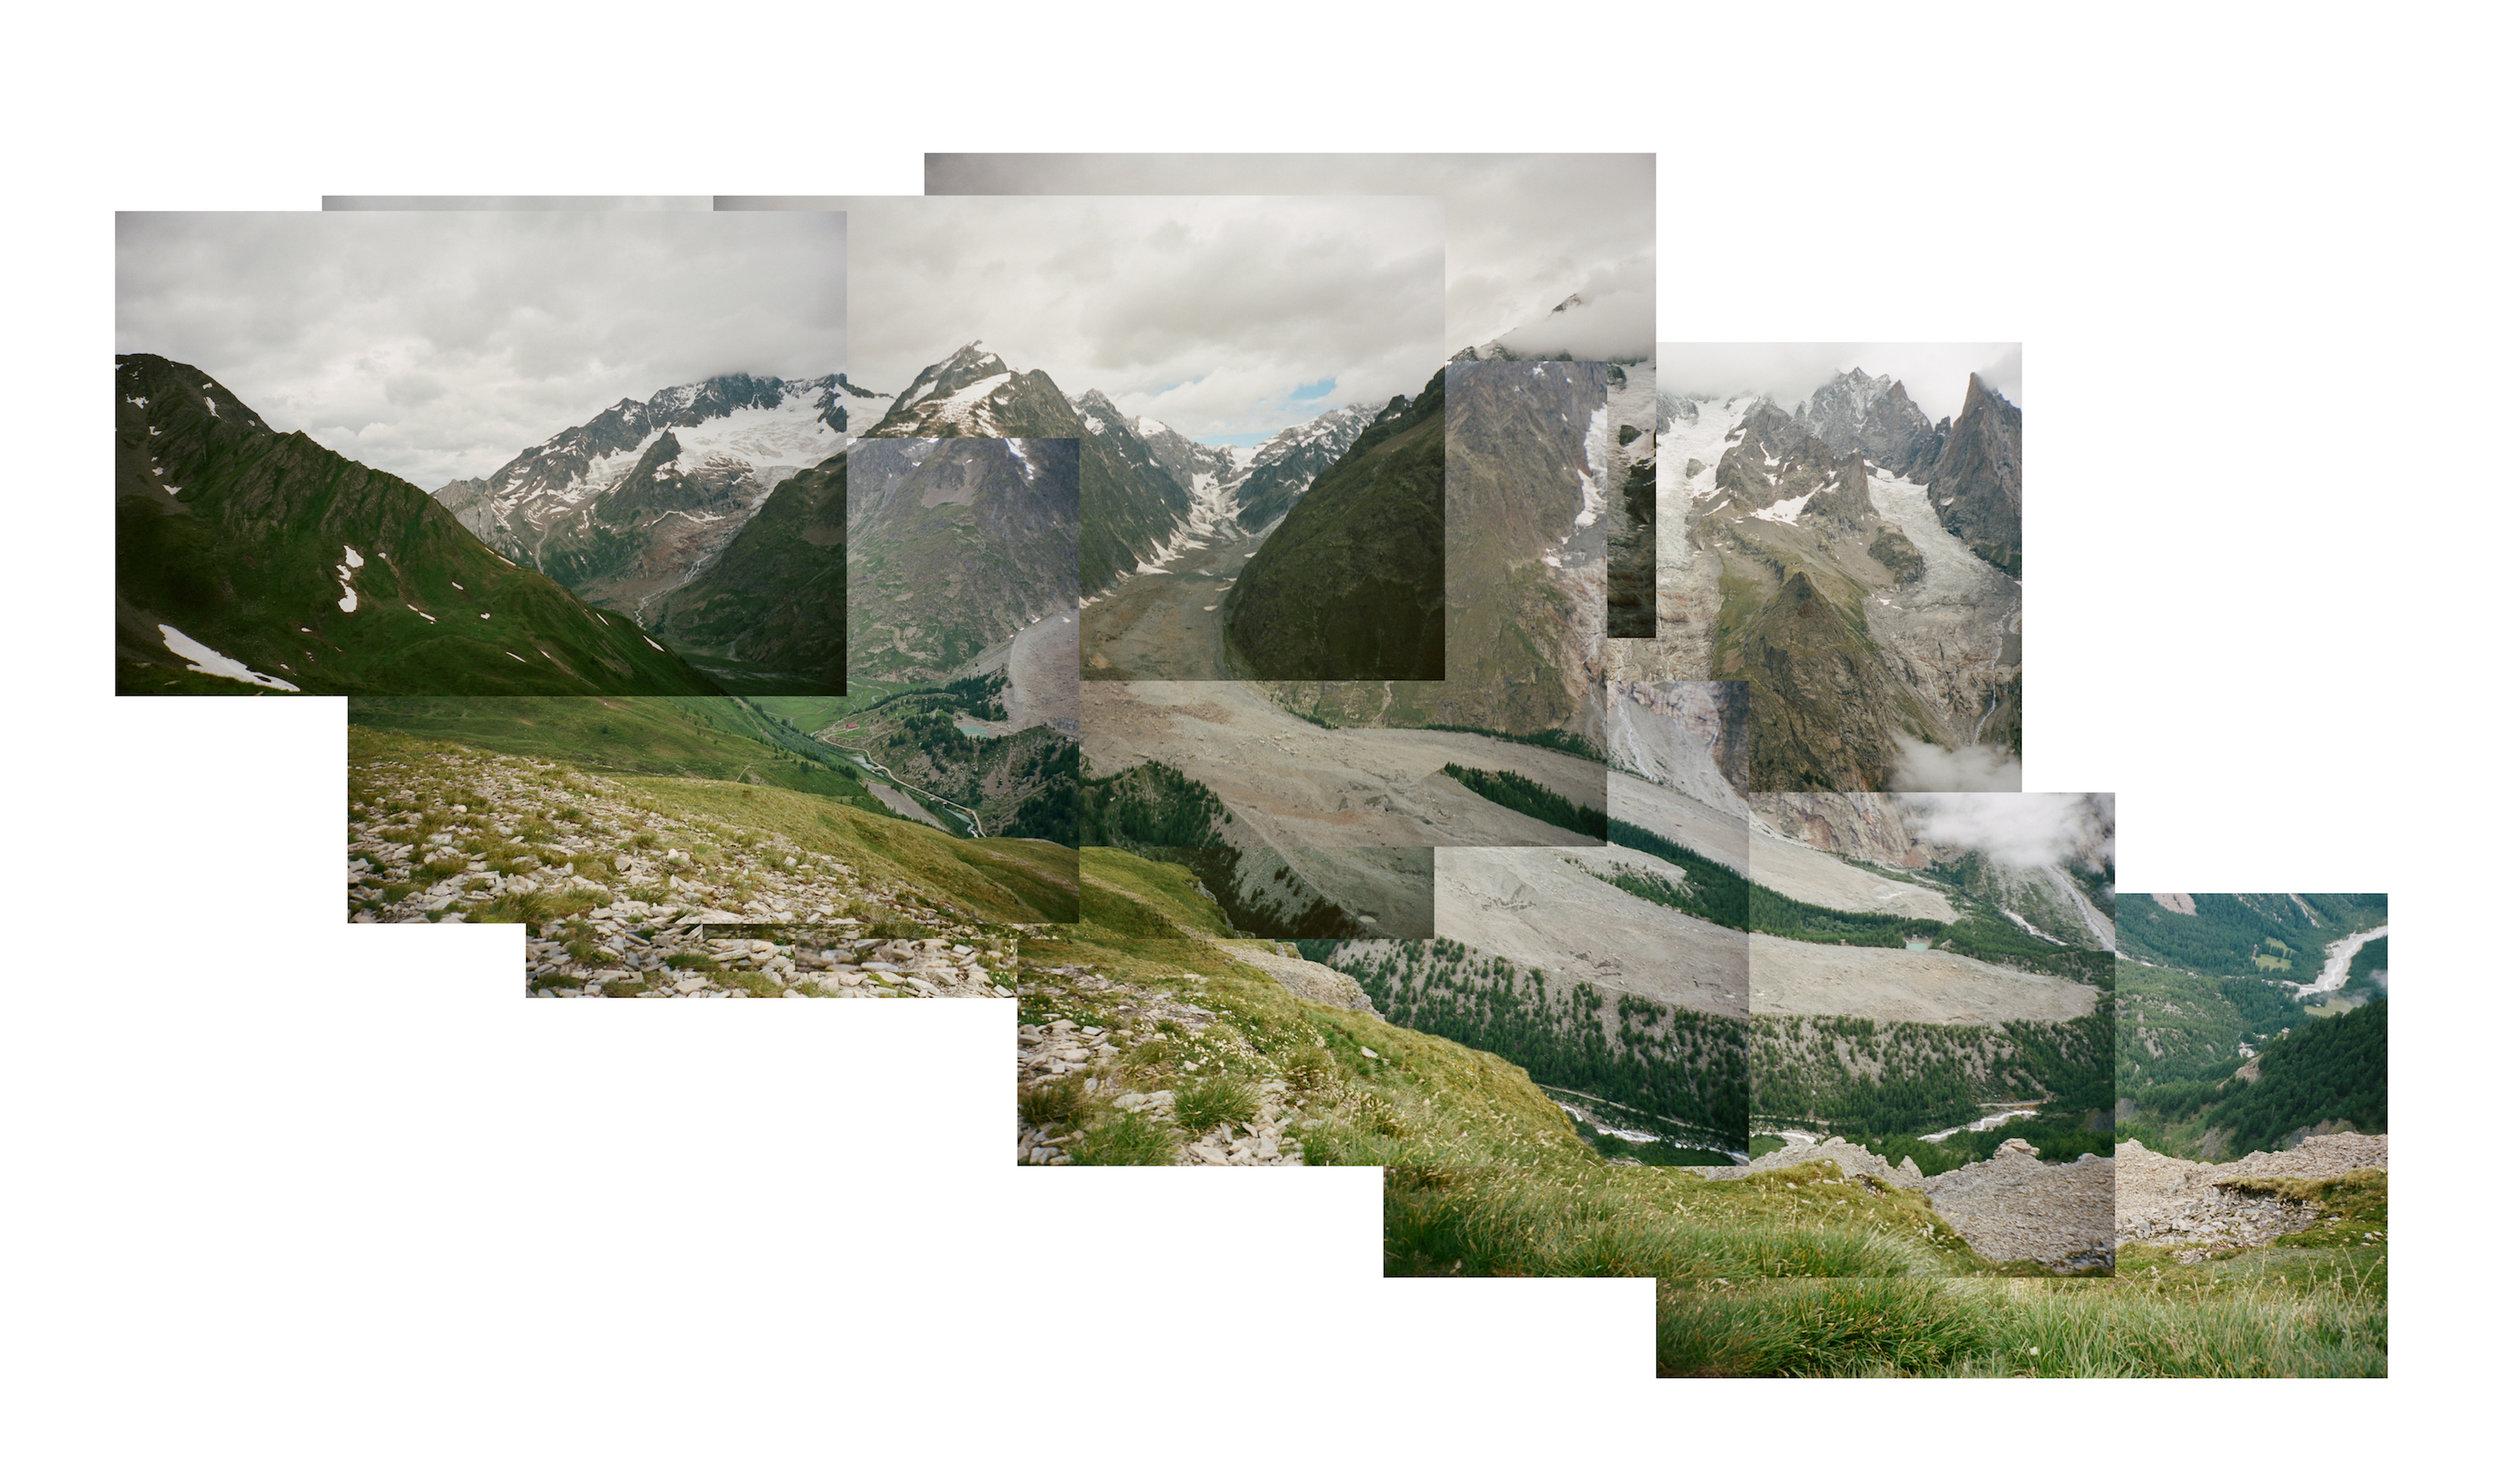 mont blanc rock slide.jpg